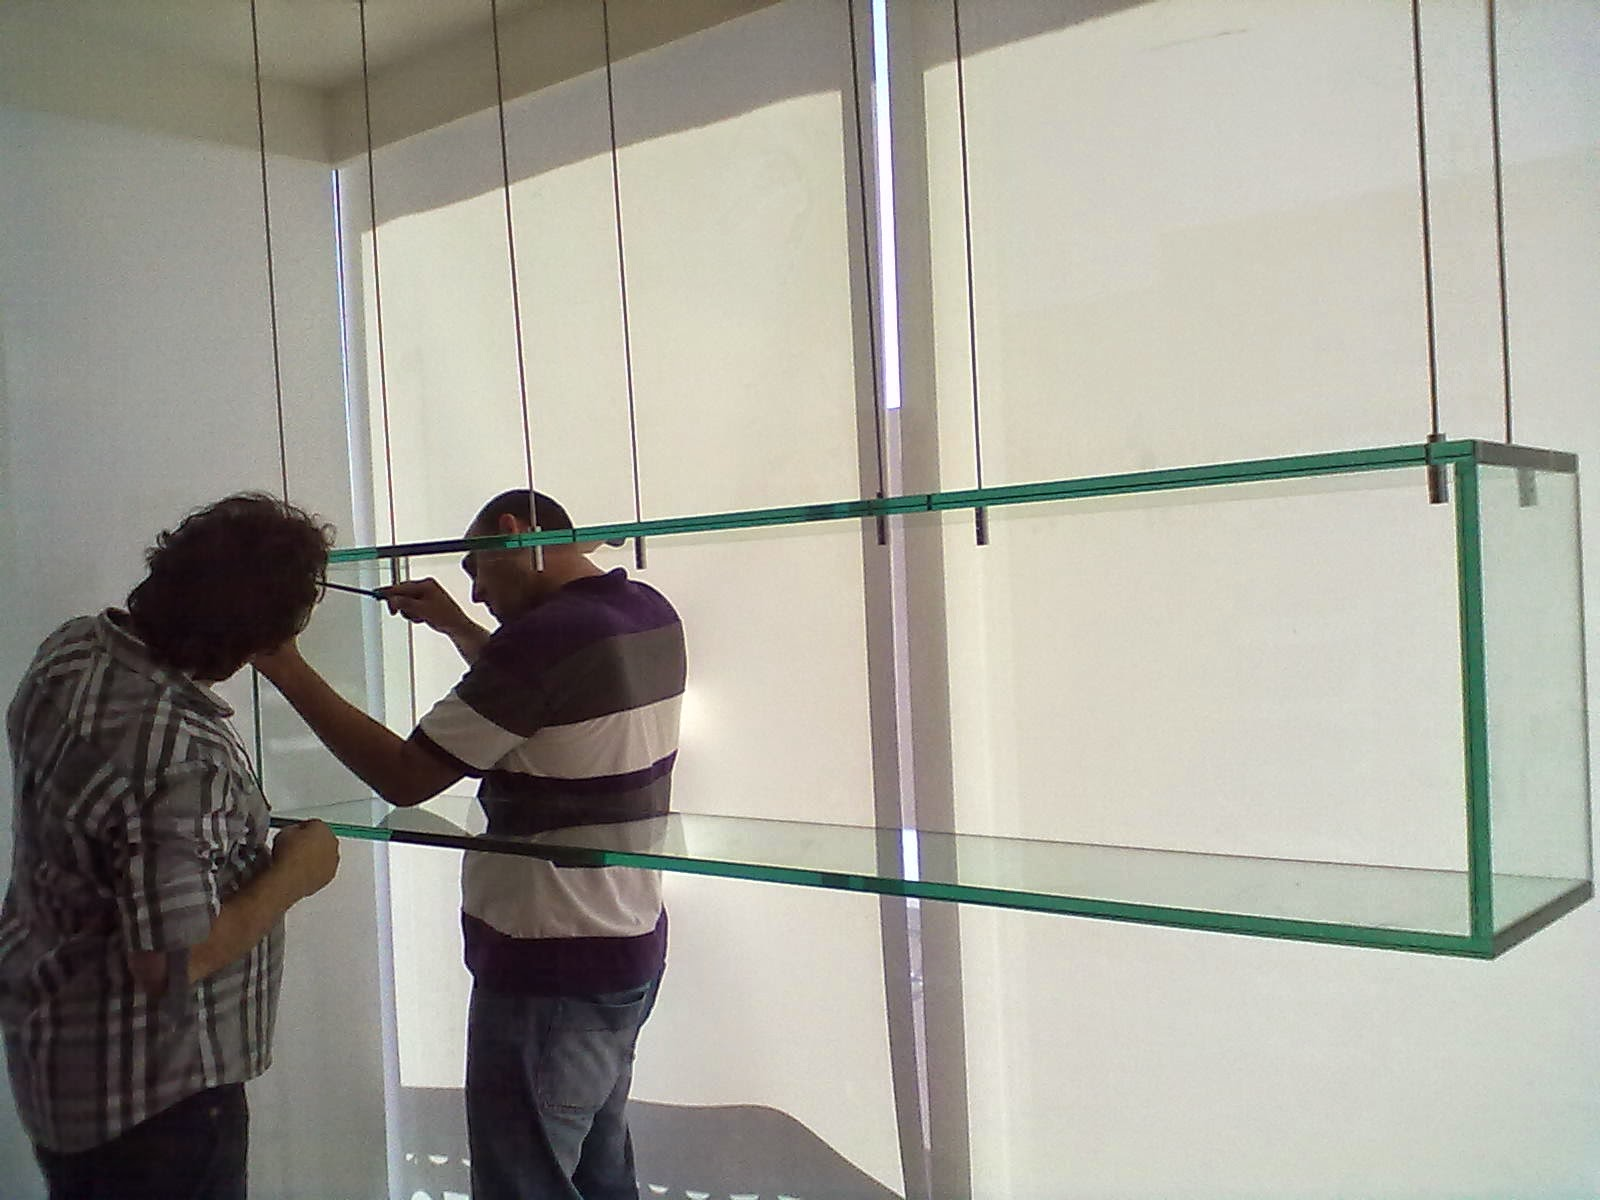 foto-Itaim-bibi-vidraçaria-newartvidros-são-paulo